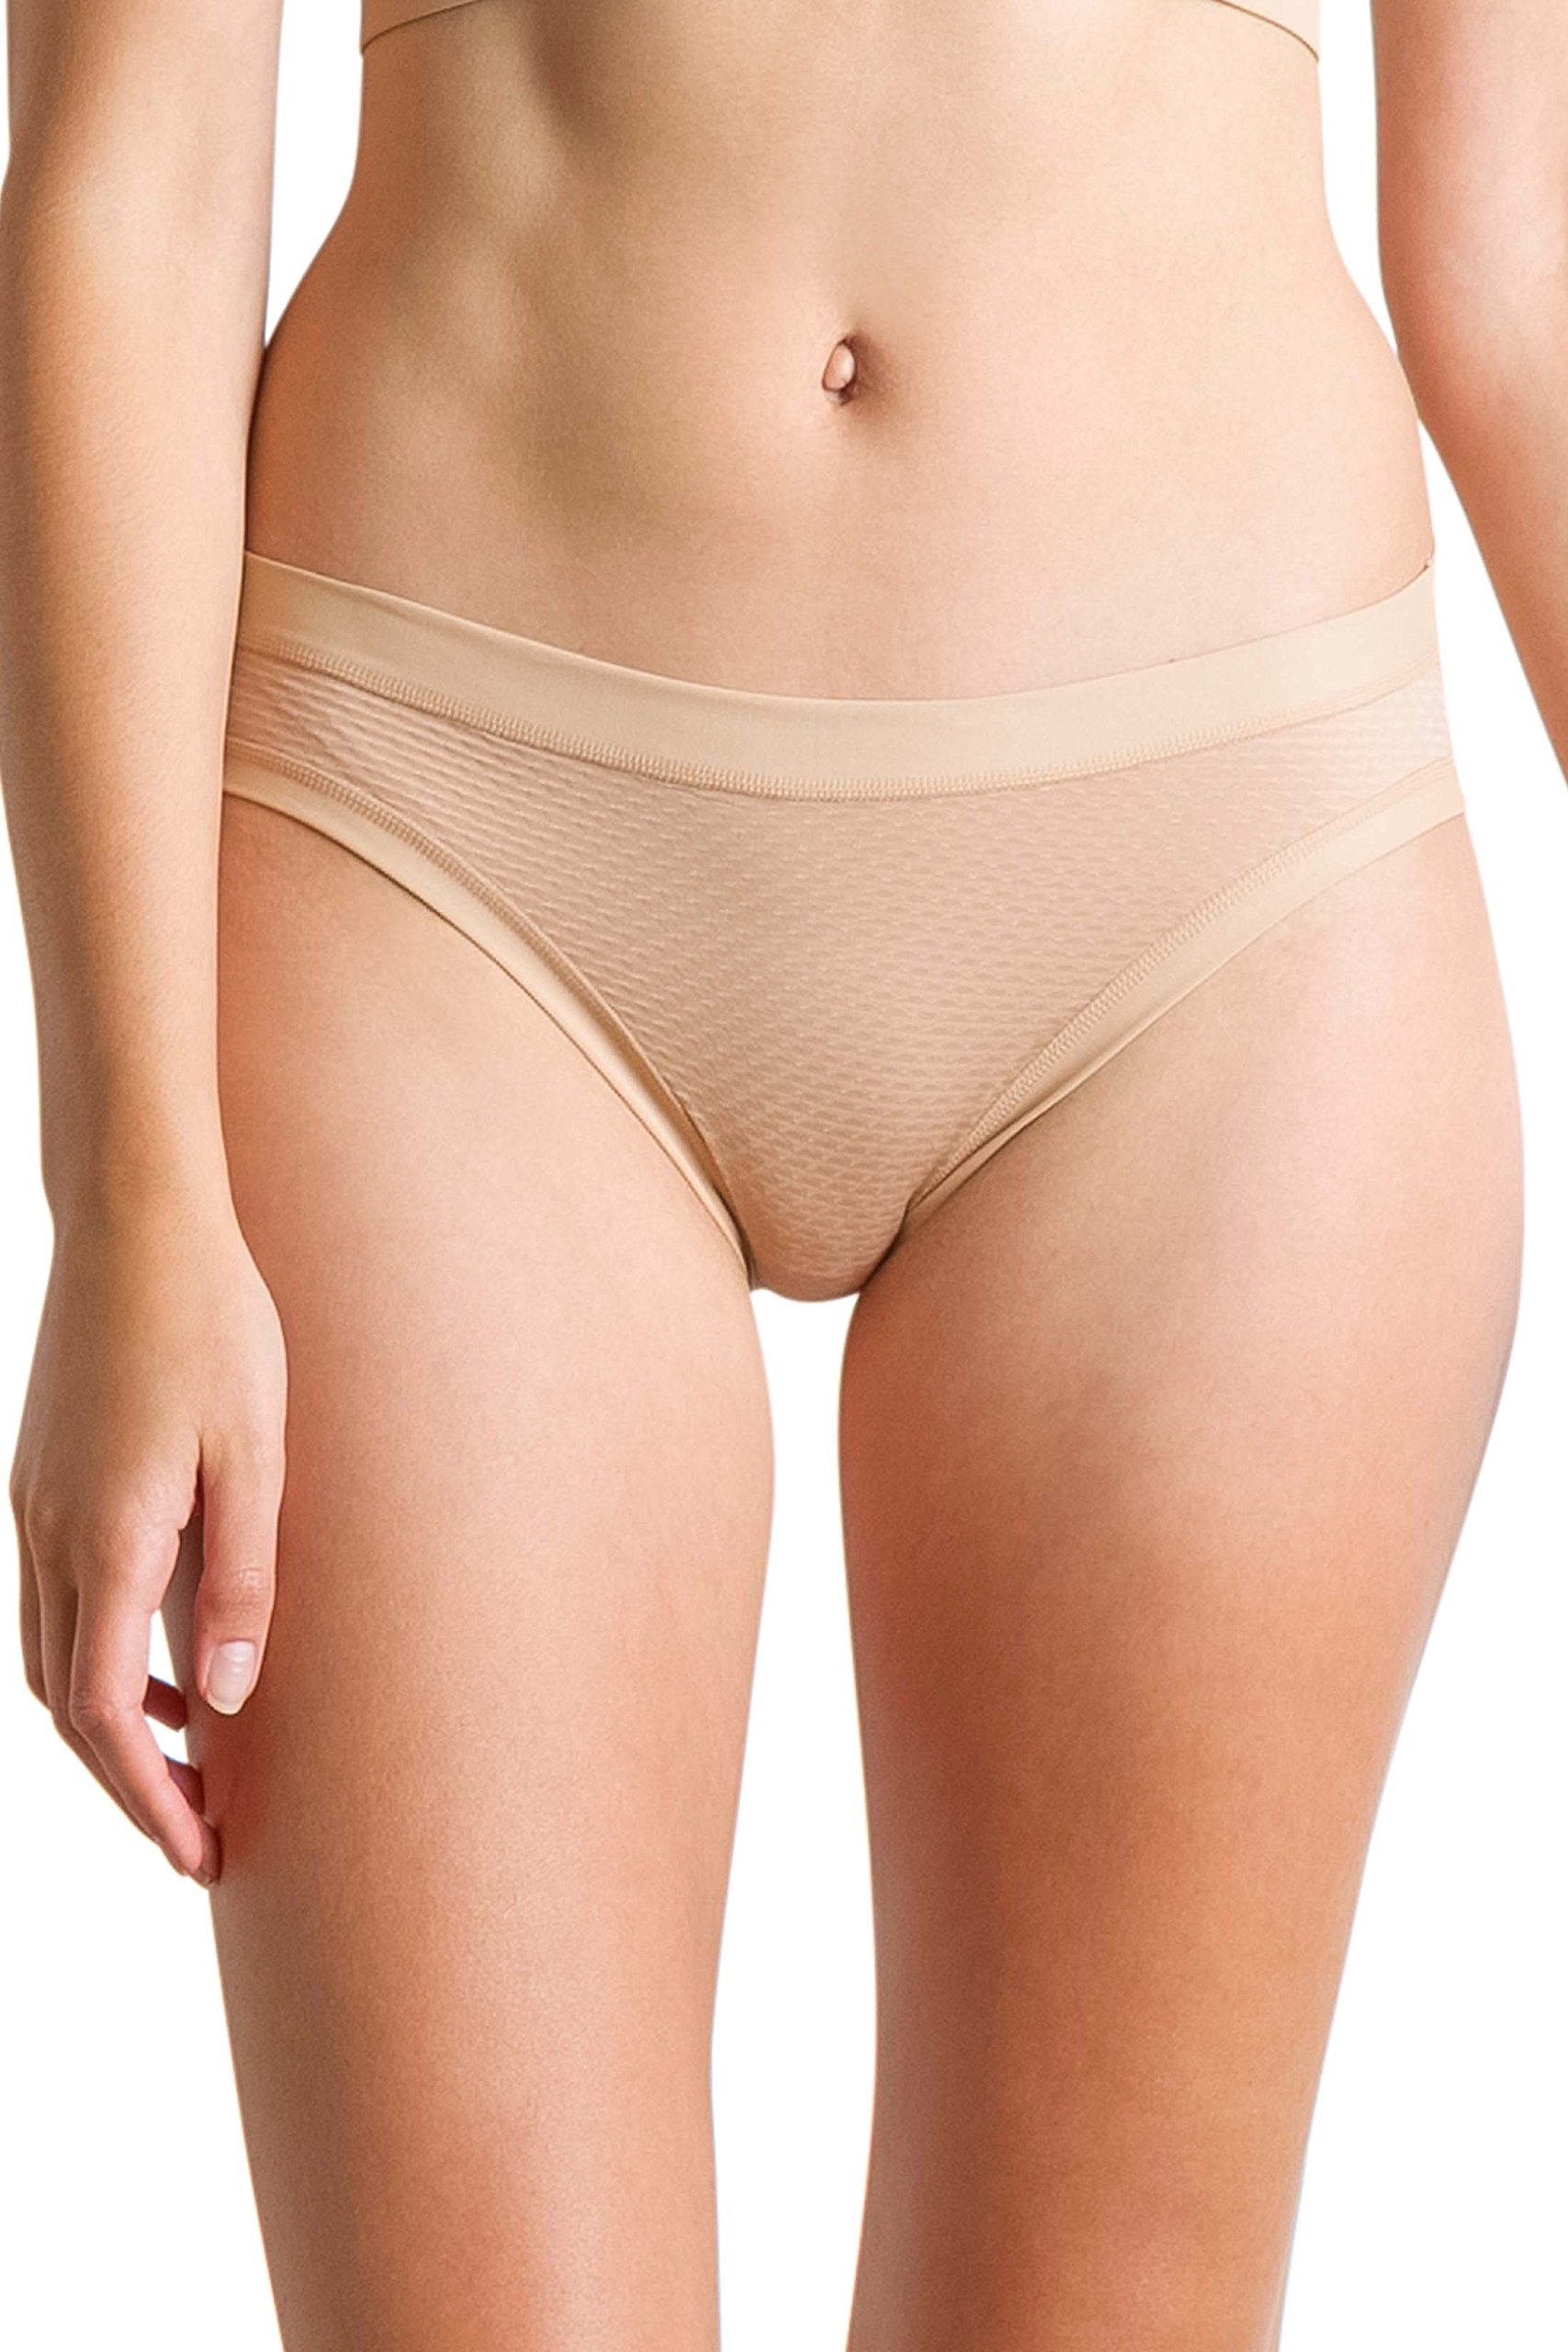 ExOfficio Women's Give-N-Go Sport Mesh Bikini Brief, Buff, Small